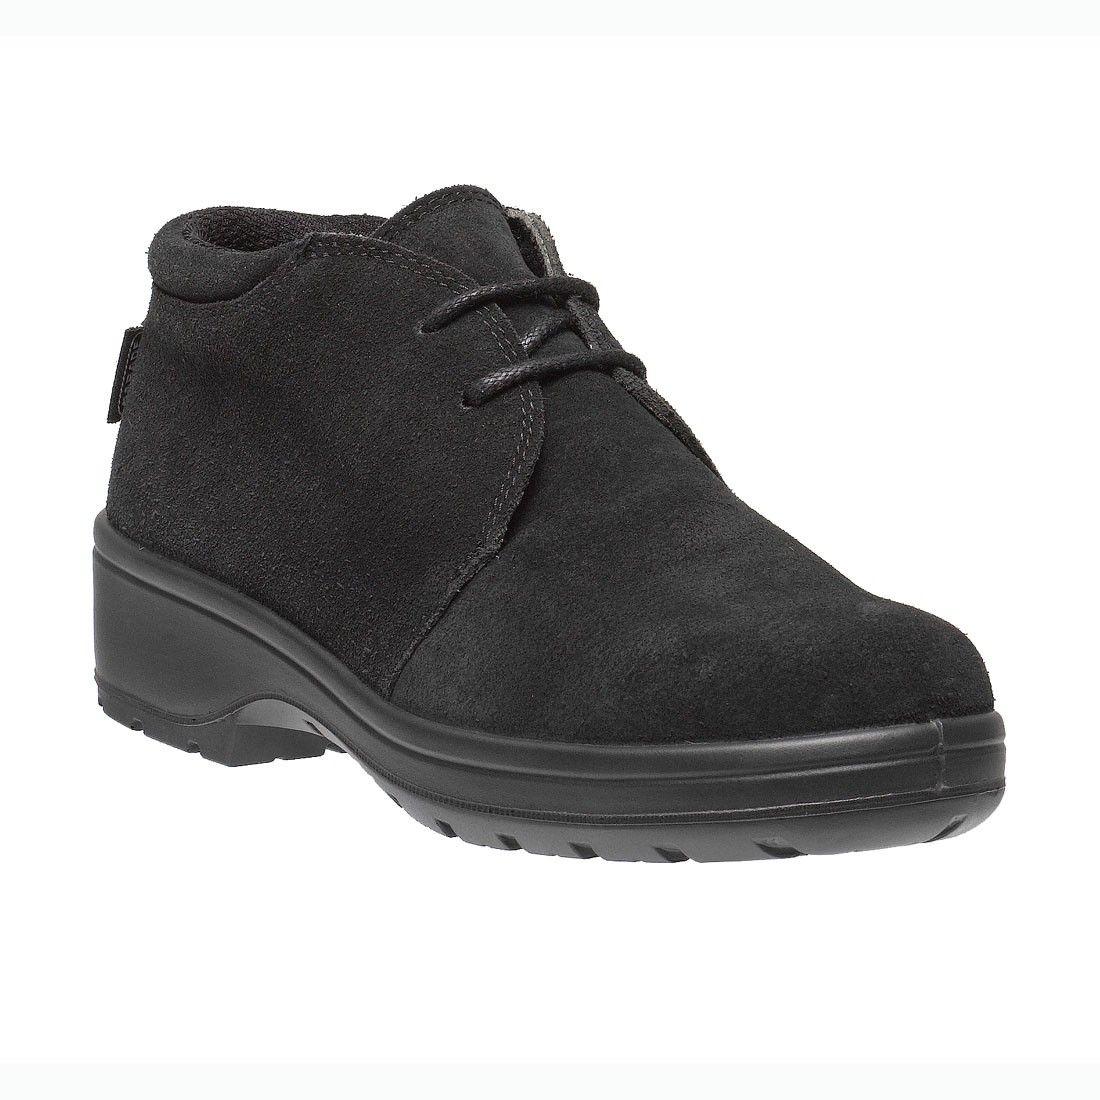 212bb00e7a0b Dana Ladies Lightweight Desert Style S3 Black Leather Safety Work Boots